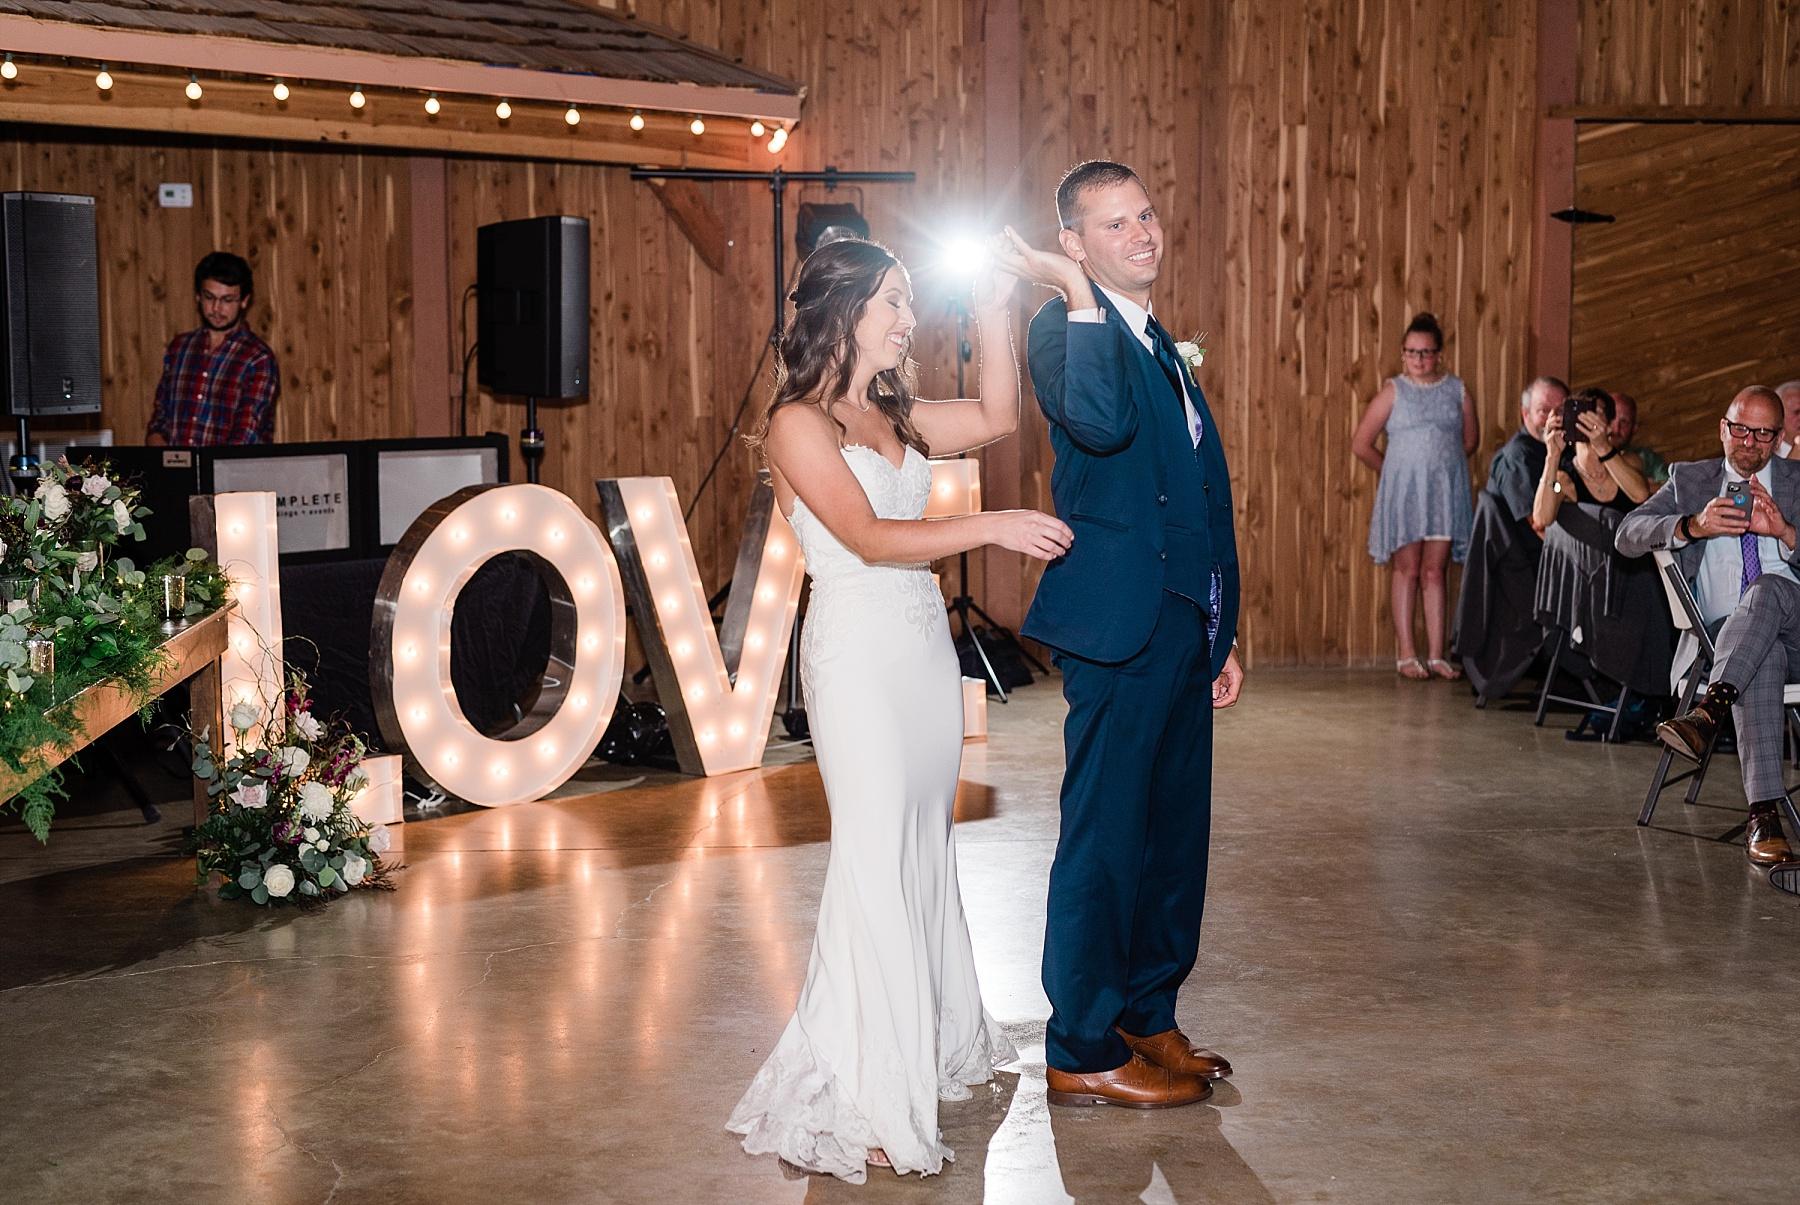 Romantic Summer Sunset Wedding Ceremony at Little Piney Lodge St. Louis Missouri by Kelsi Kliethermes Photography Fine Art Photographer_0020.jpg